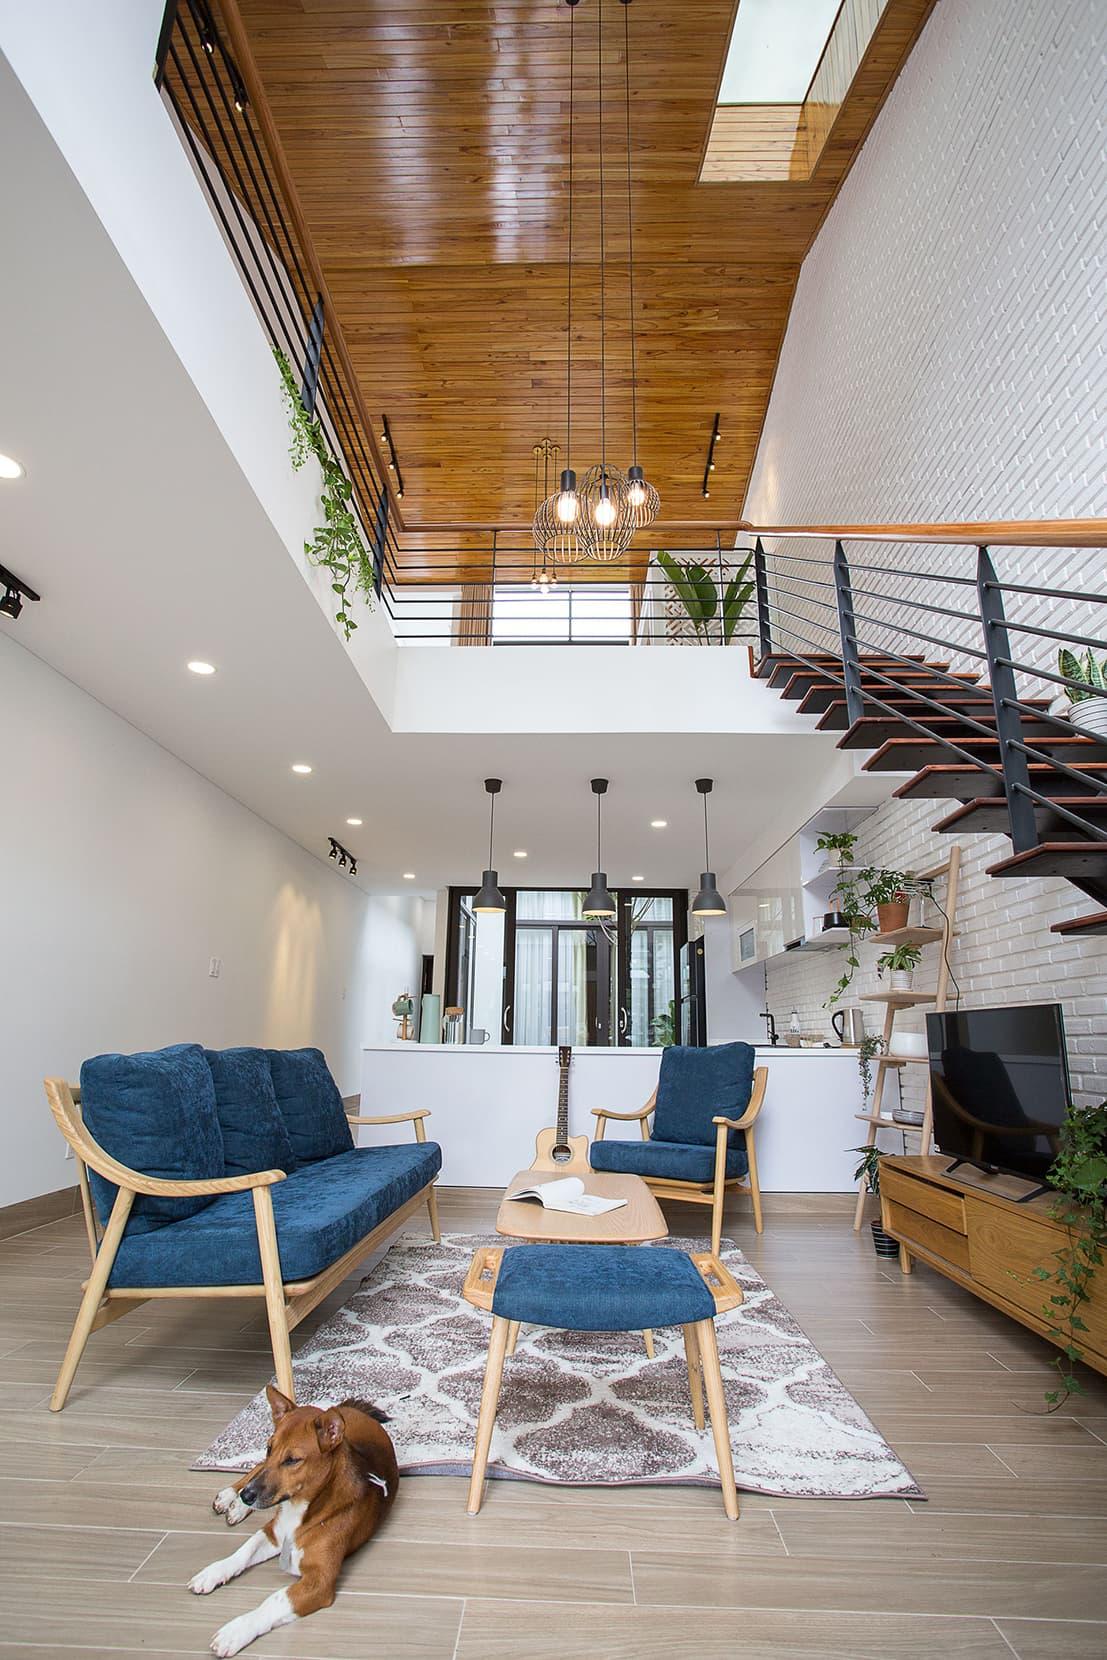 Minimalist House By 85 Design In Vietnam Hypebeast